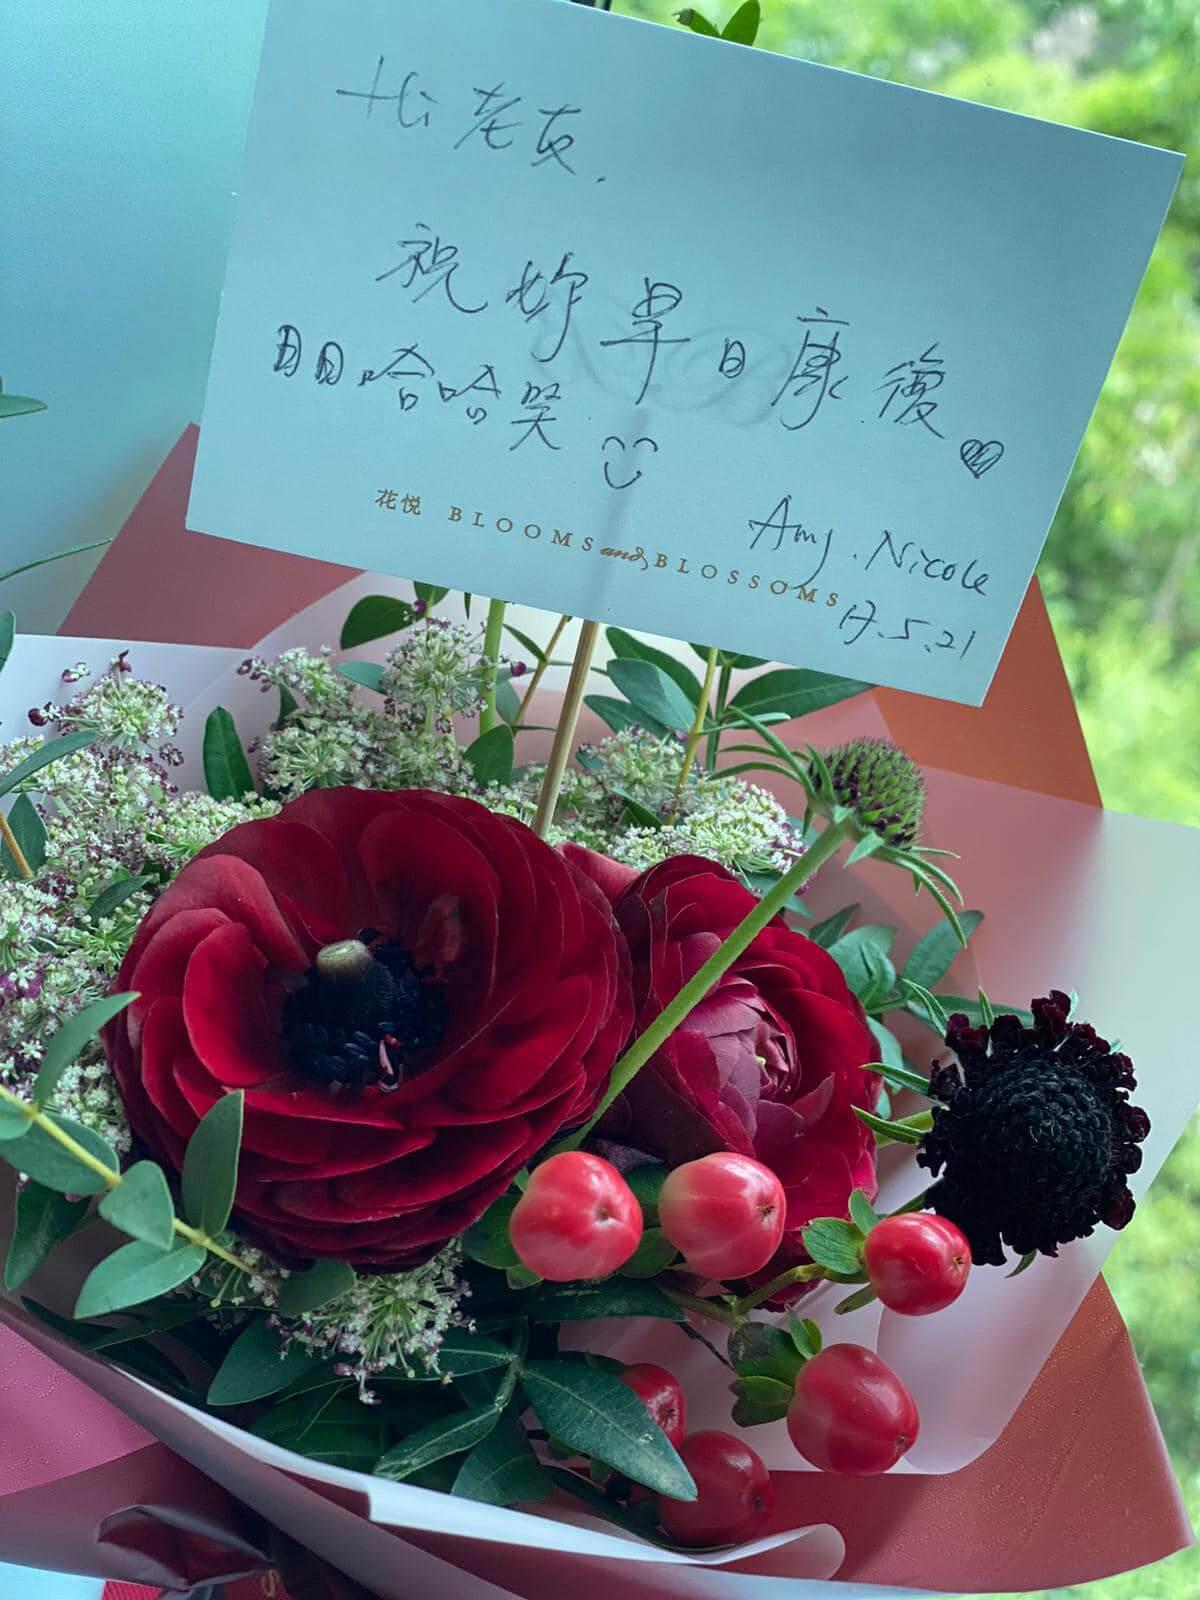 Vivian收到老友送的花,她又祝福大家身體健康、開心快樂